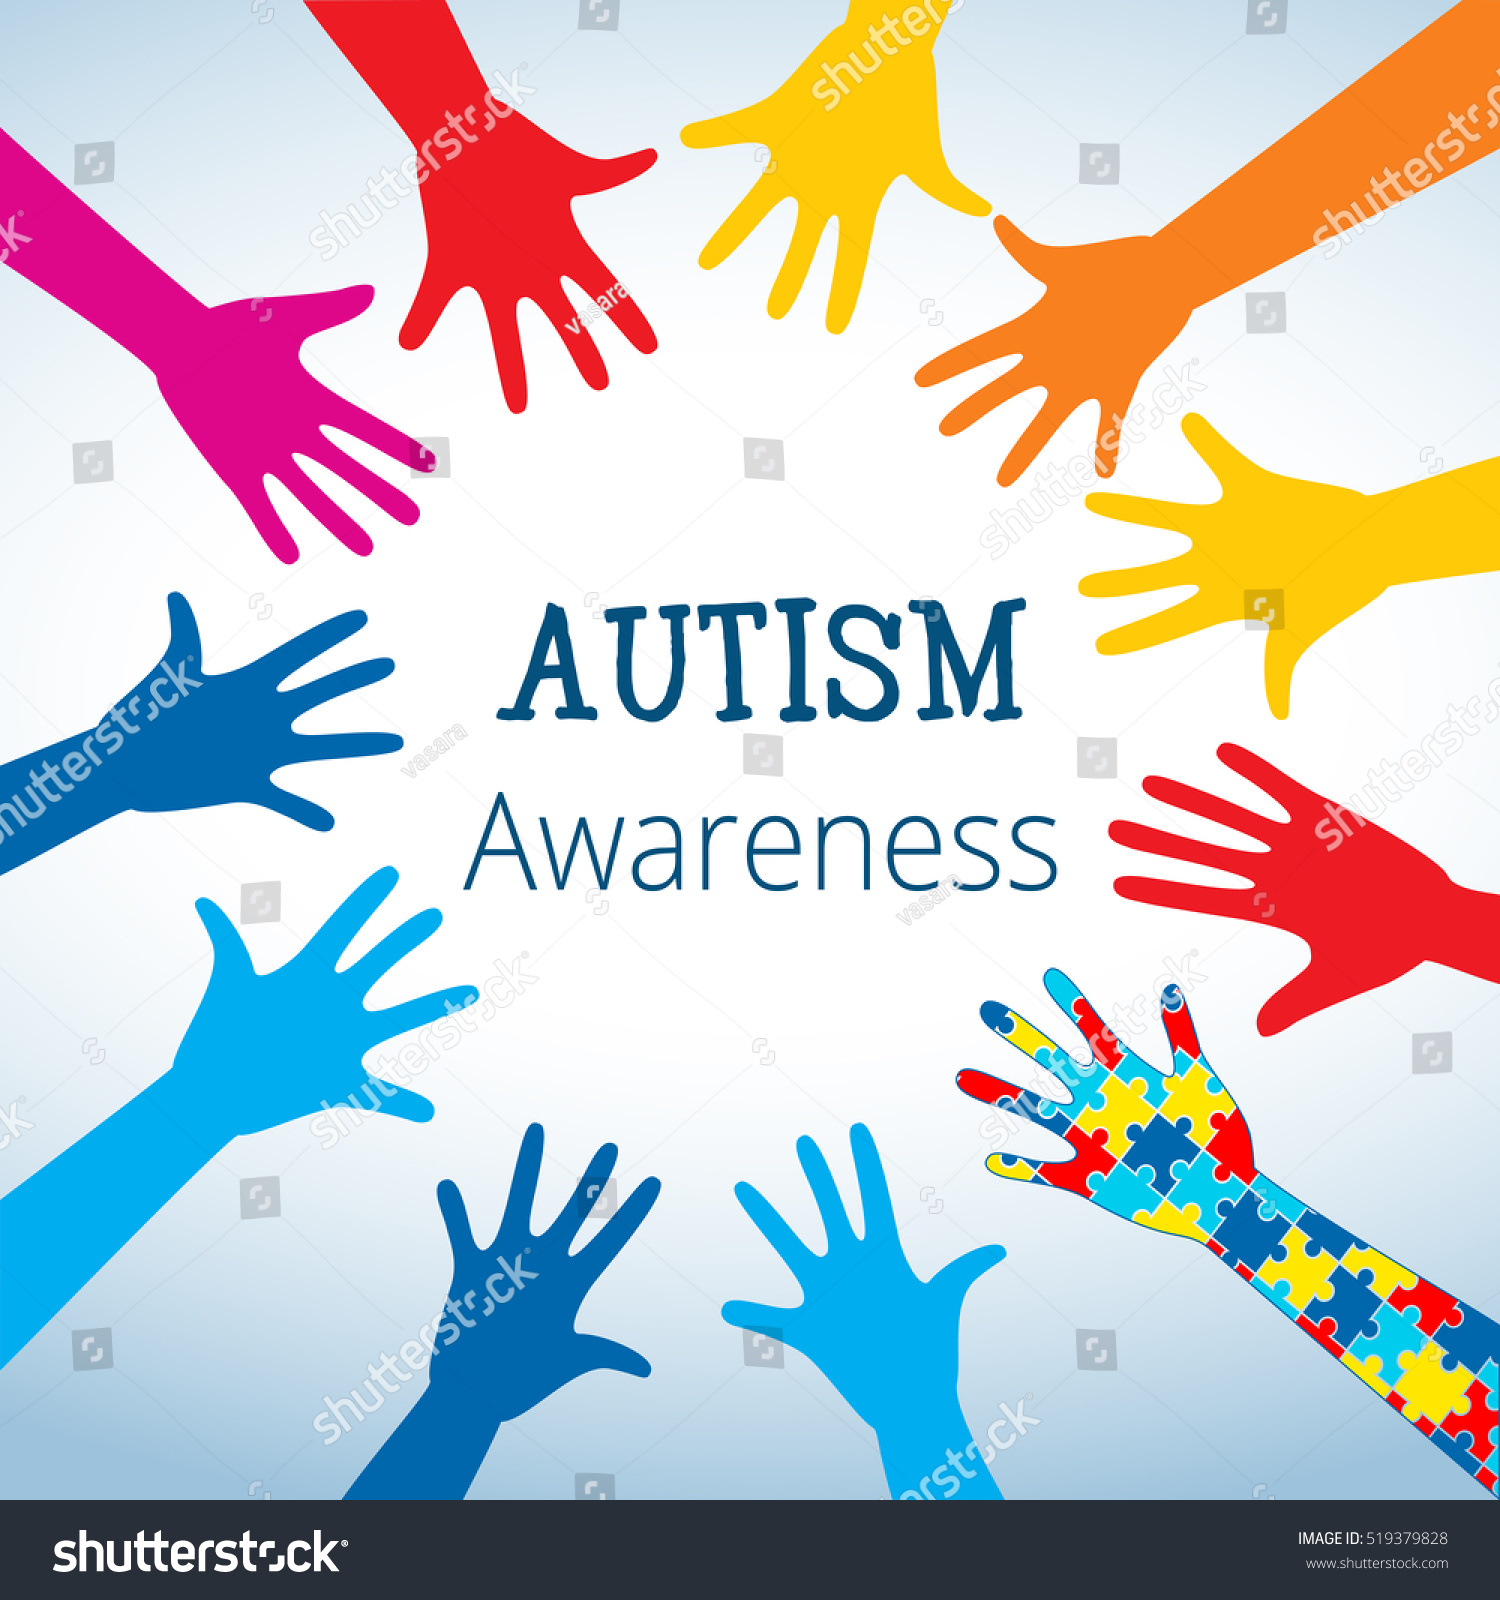 Autism Awareness Concept Hand Puzzle Pieces Stock Vector 519379828